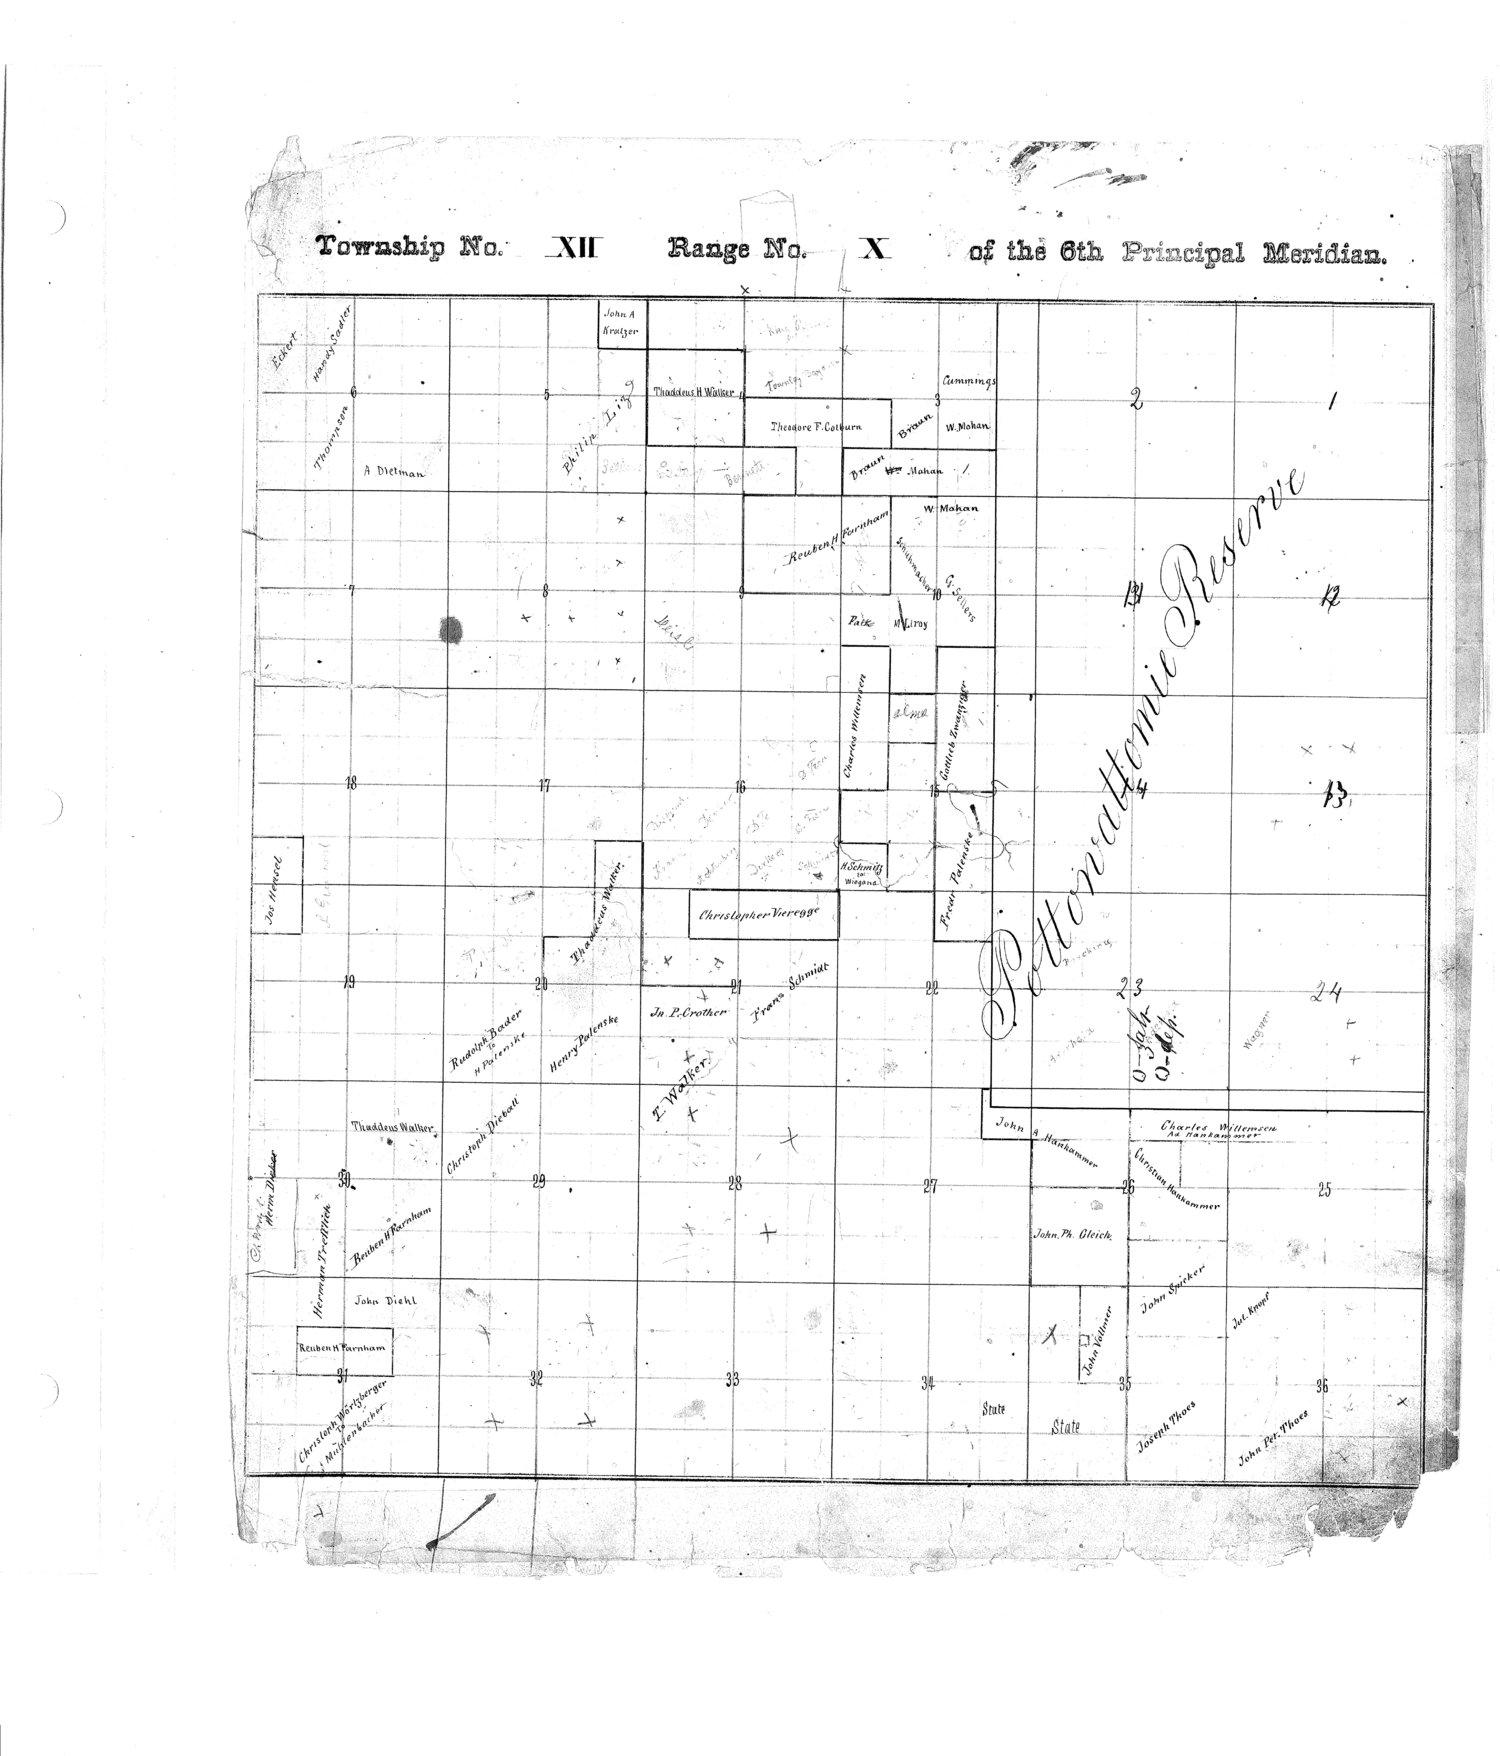 Richardson County and Wabaunsee County, Kansas, survey - 11